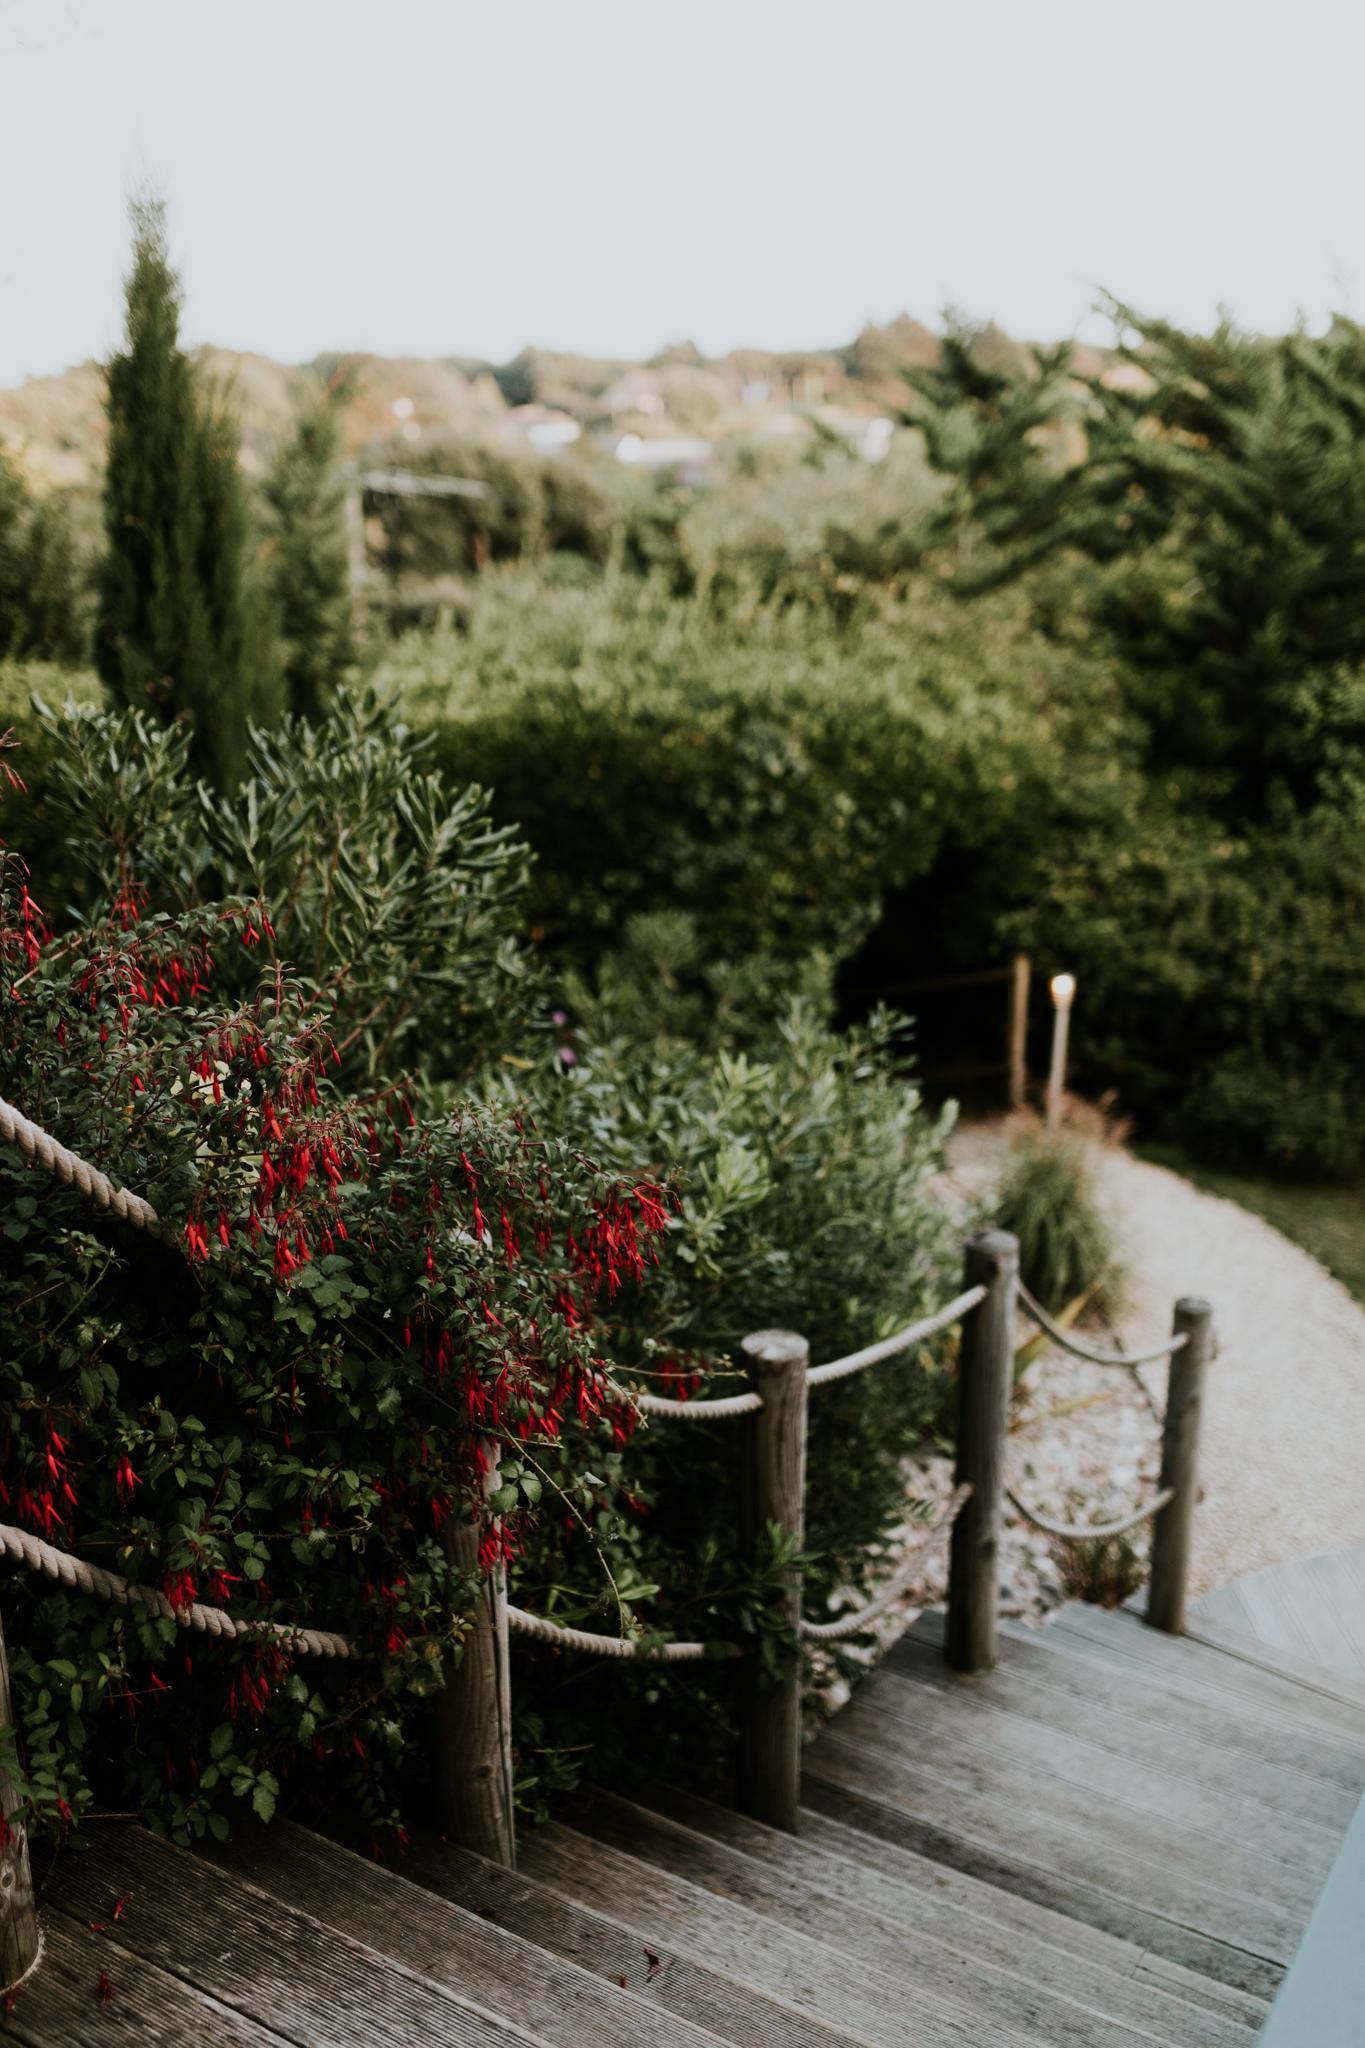 Natalie Skoric - England Travel Photography (107).jpg